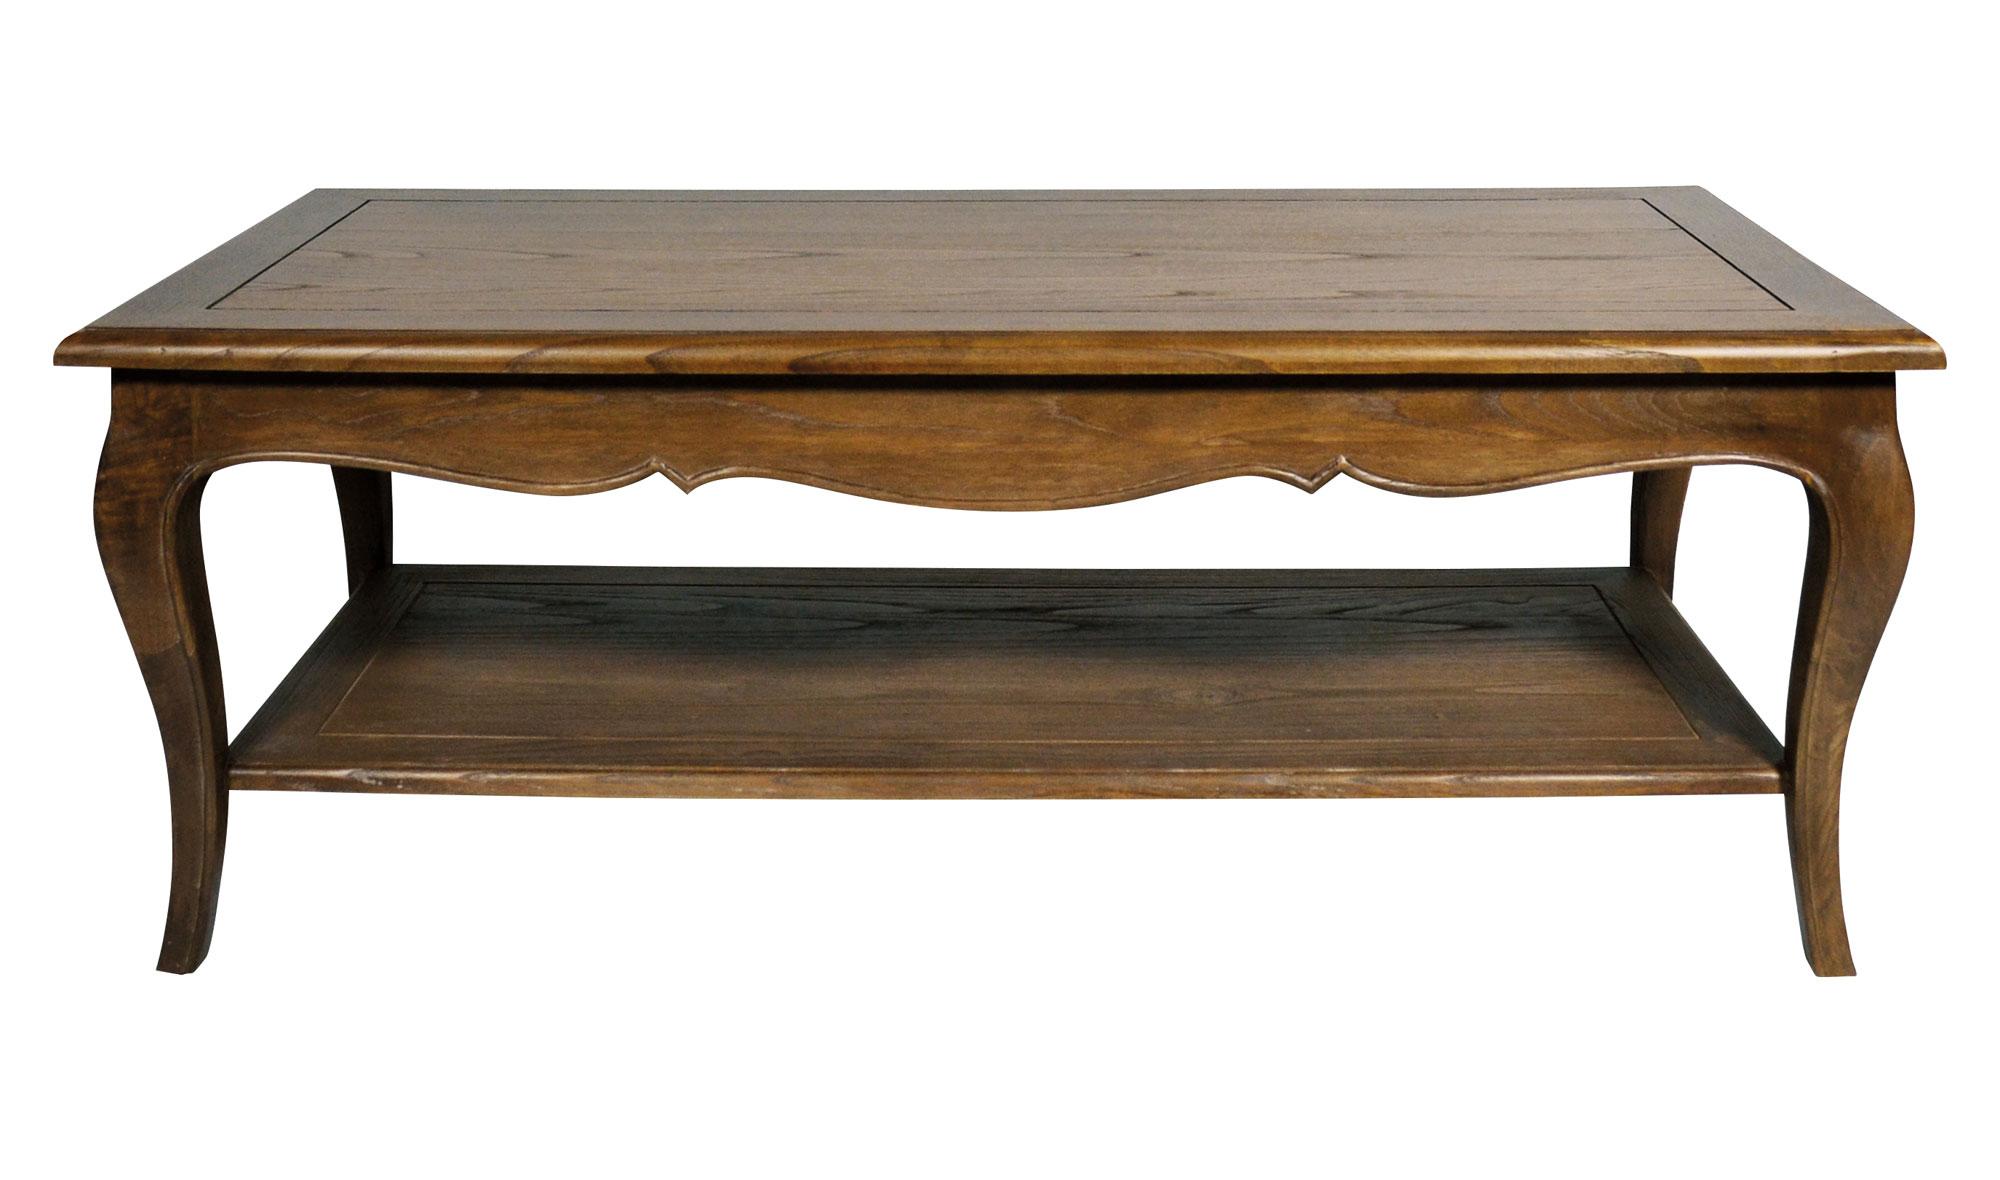 Muebles Martin Peñasco:  Mesa de centro cuadrada vintage Metaire - Mesas de Centro Vintage - Muebles Vintage